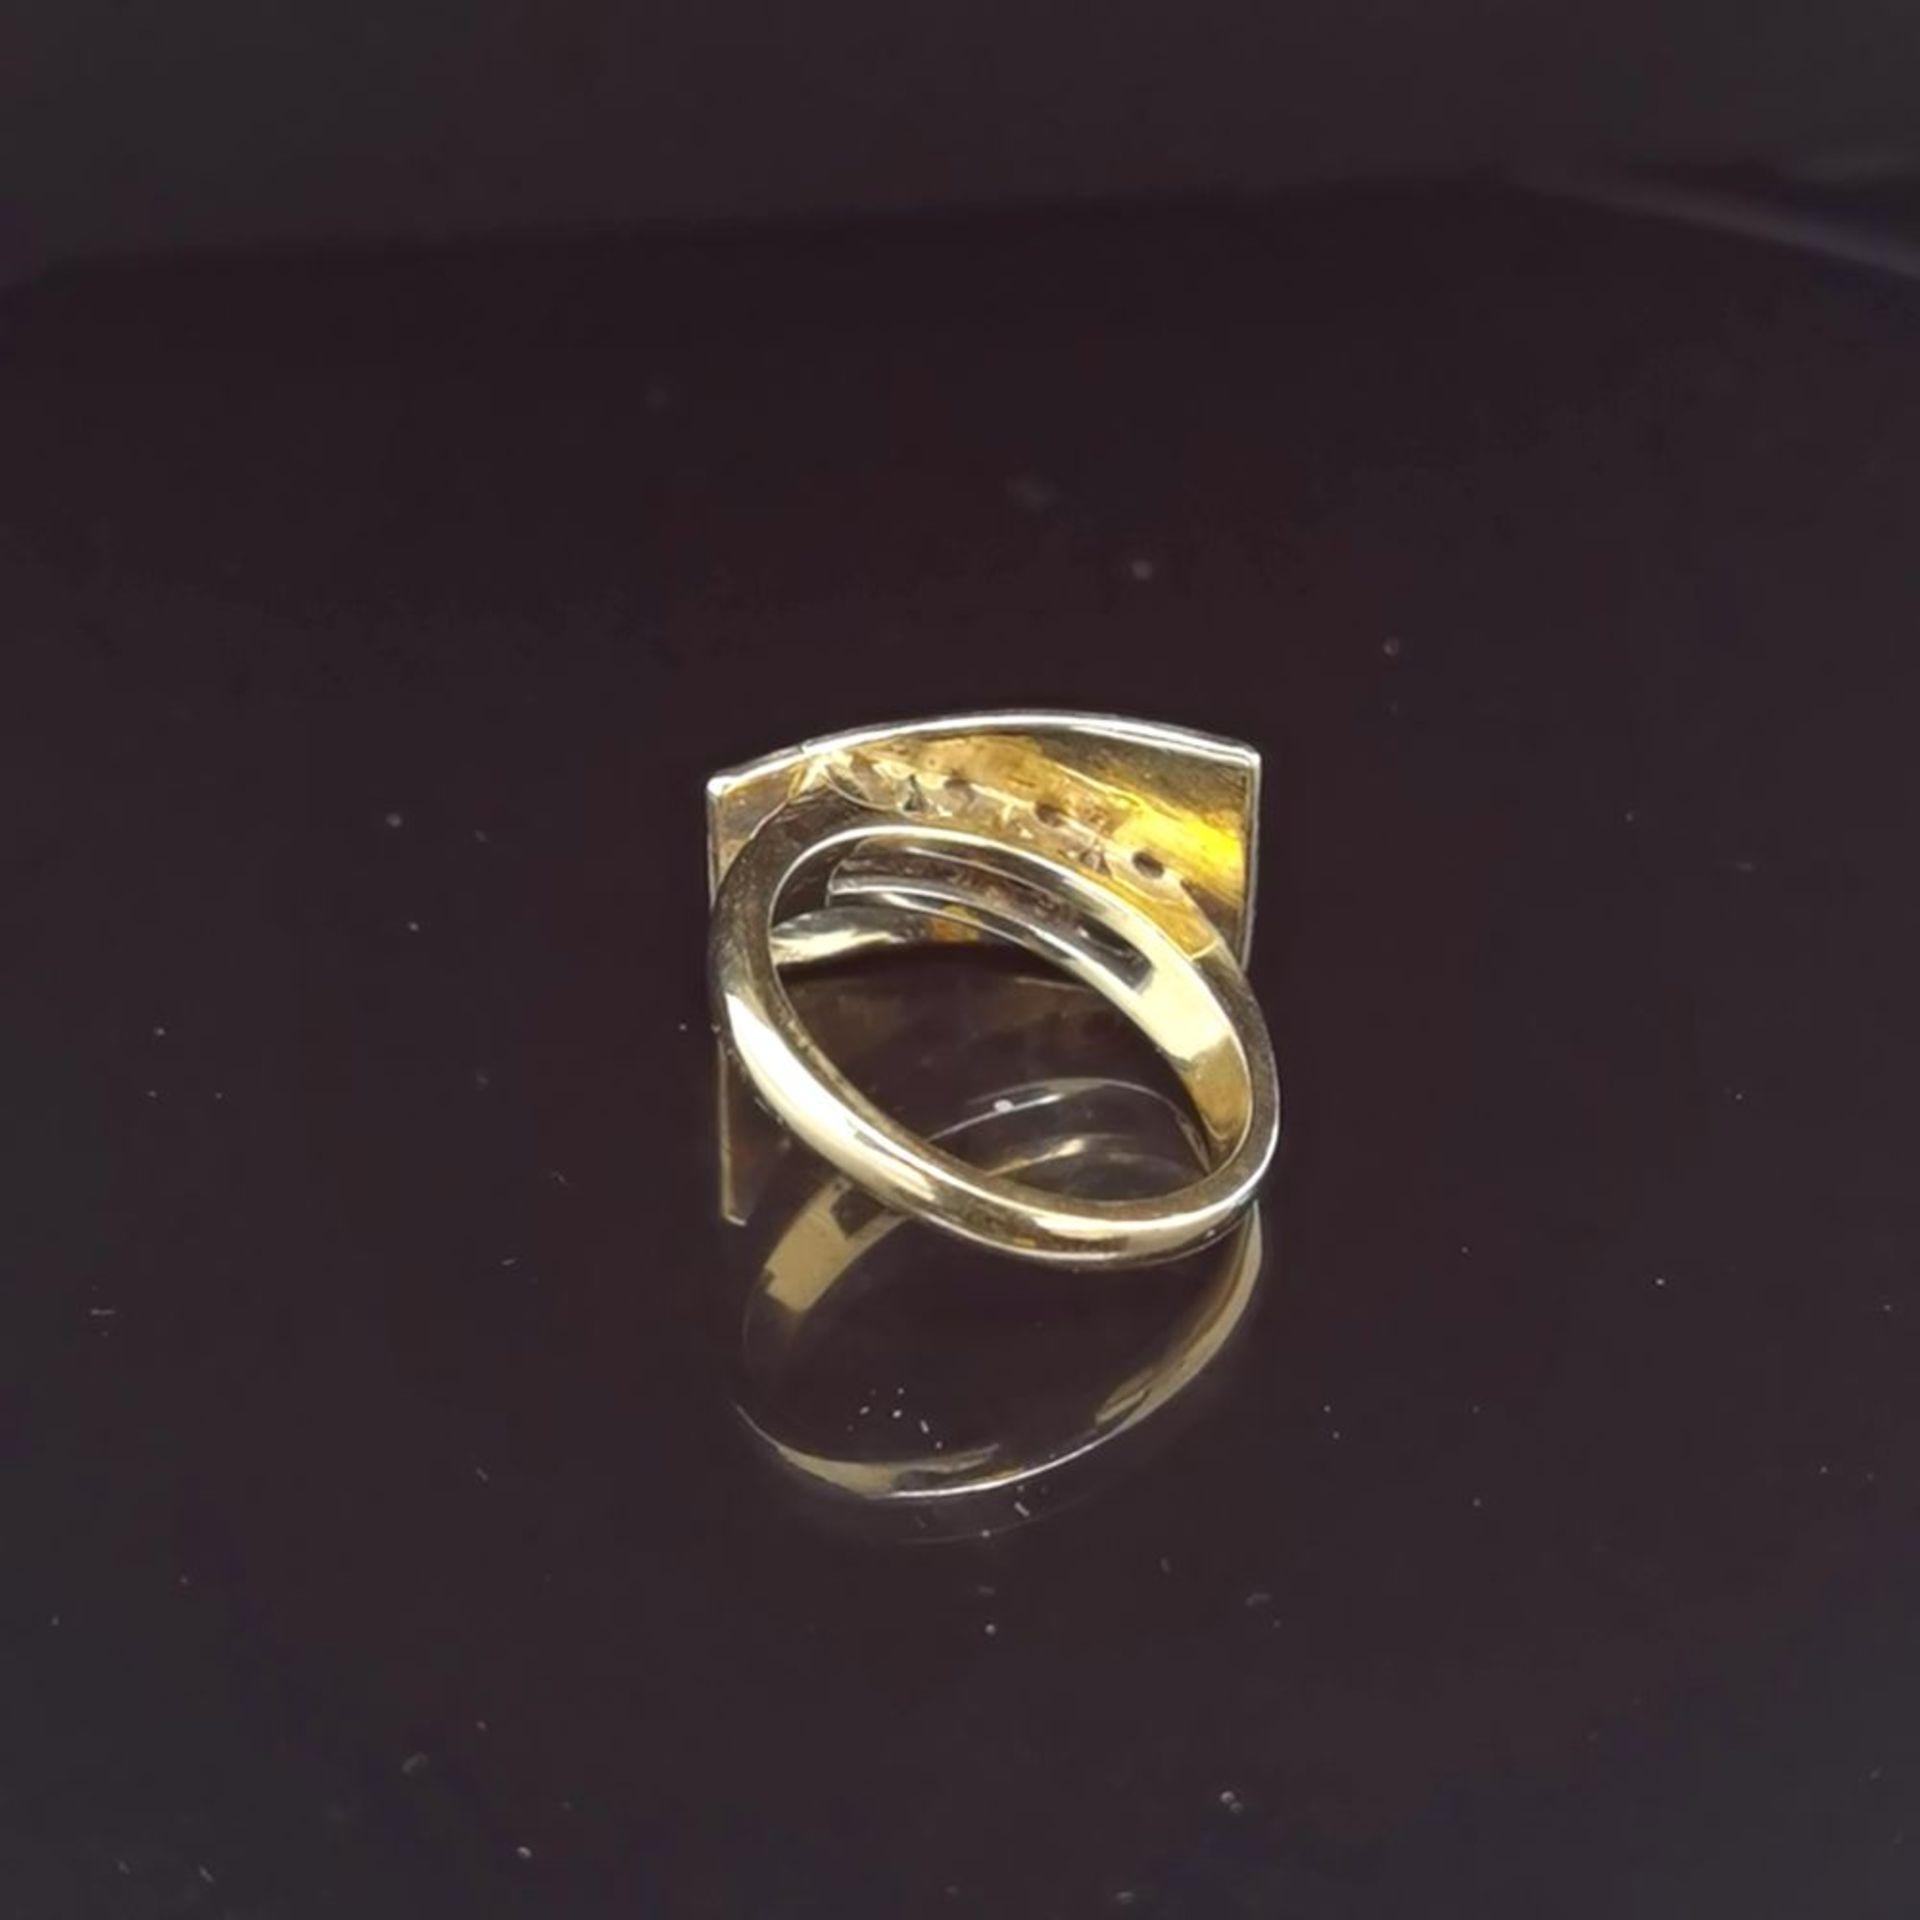 Brillant-Ring, 585 Gelbgold 7,18 - Image 3 of 3